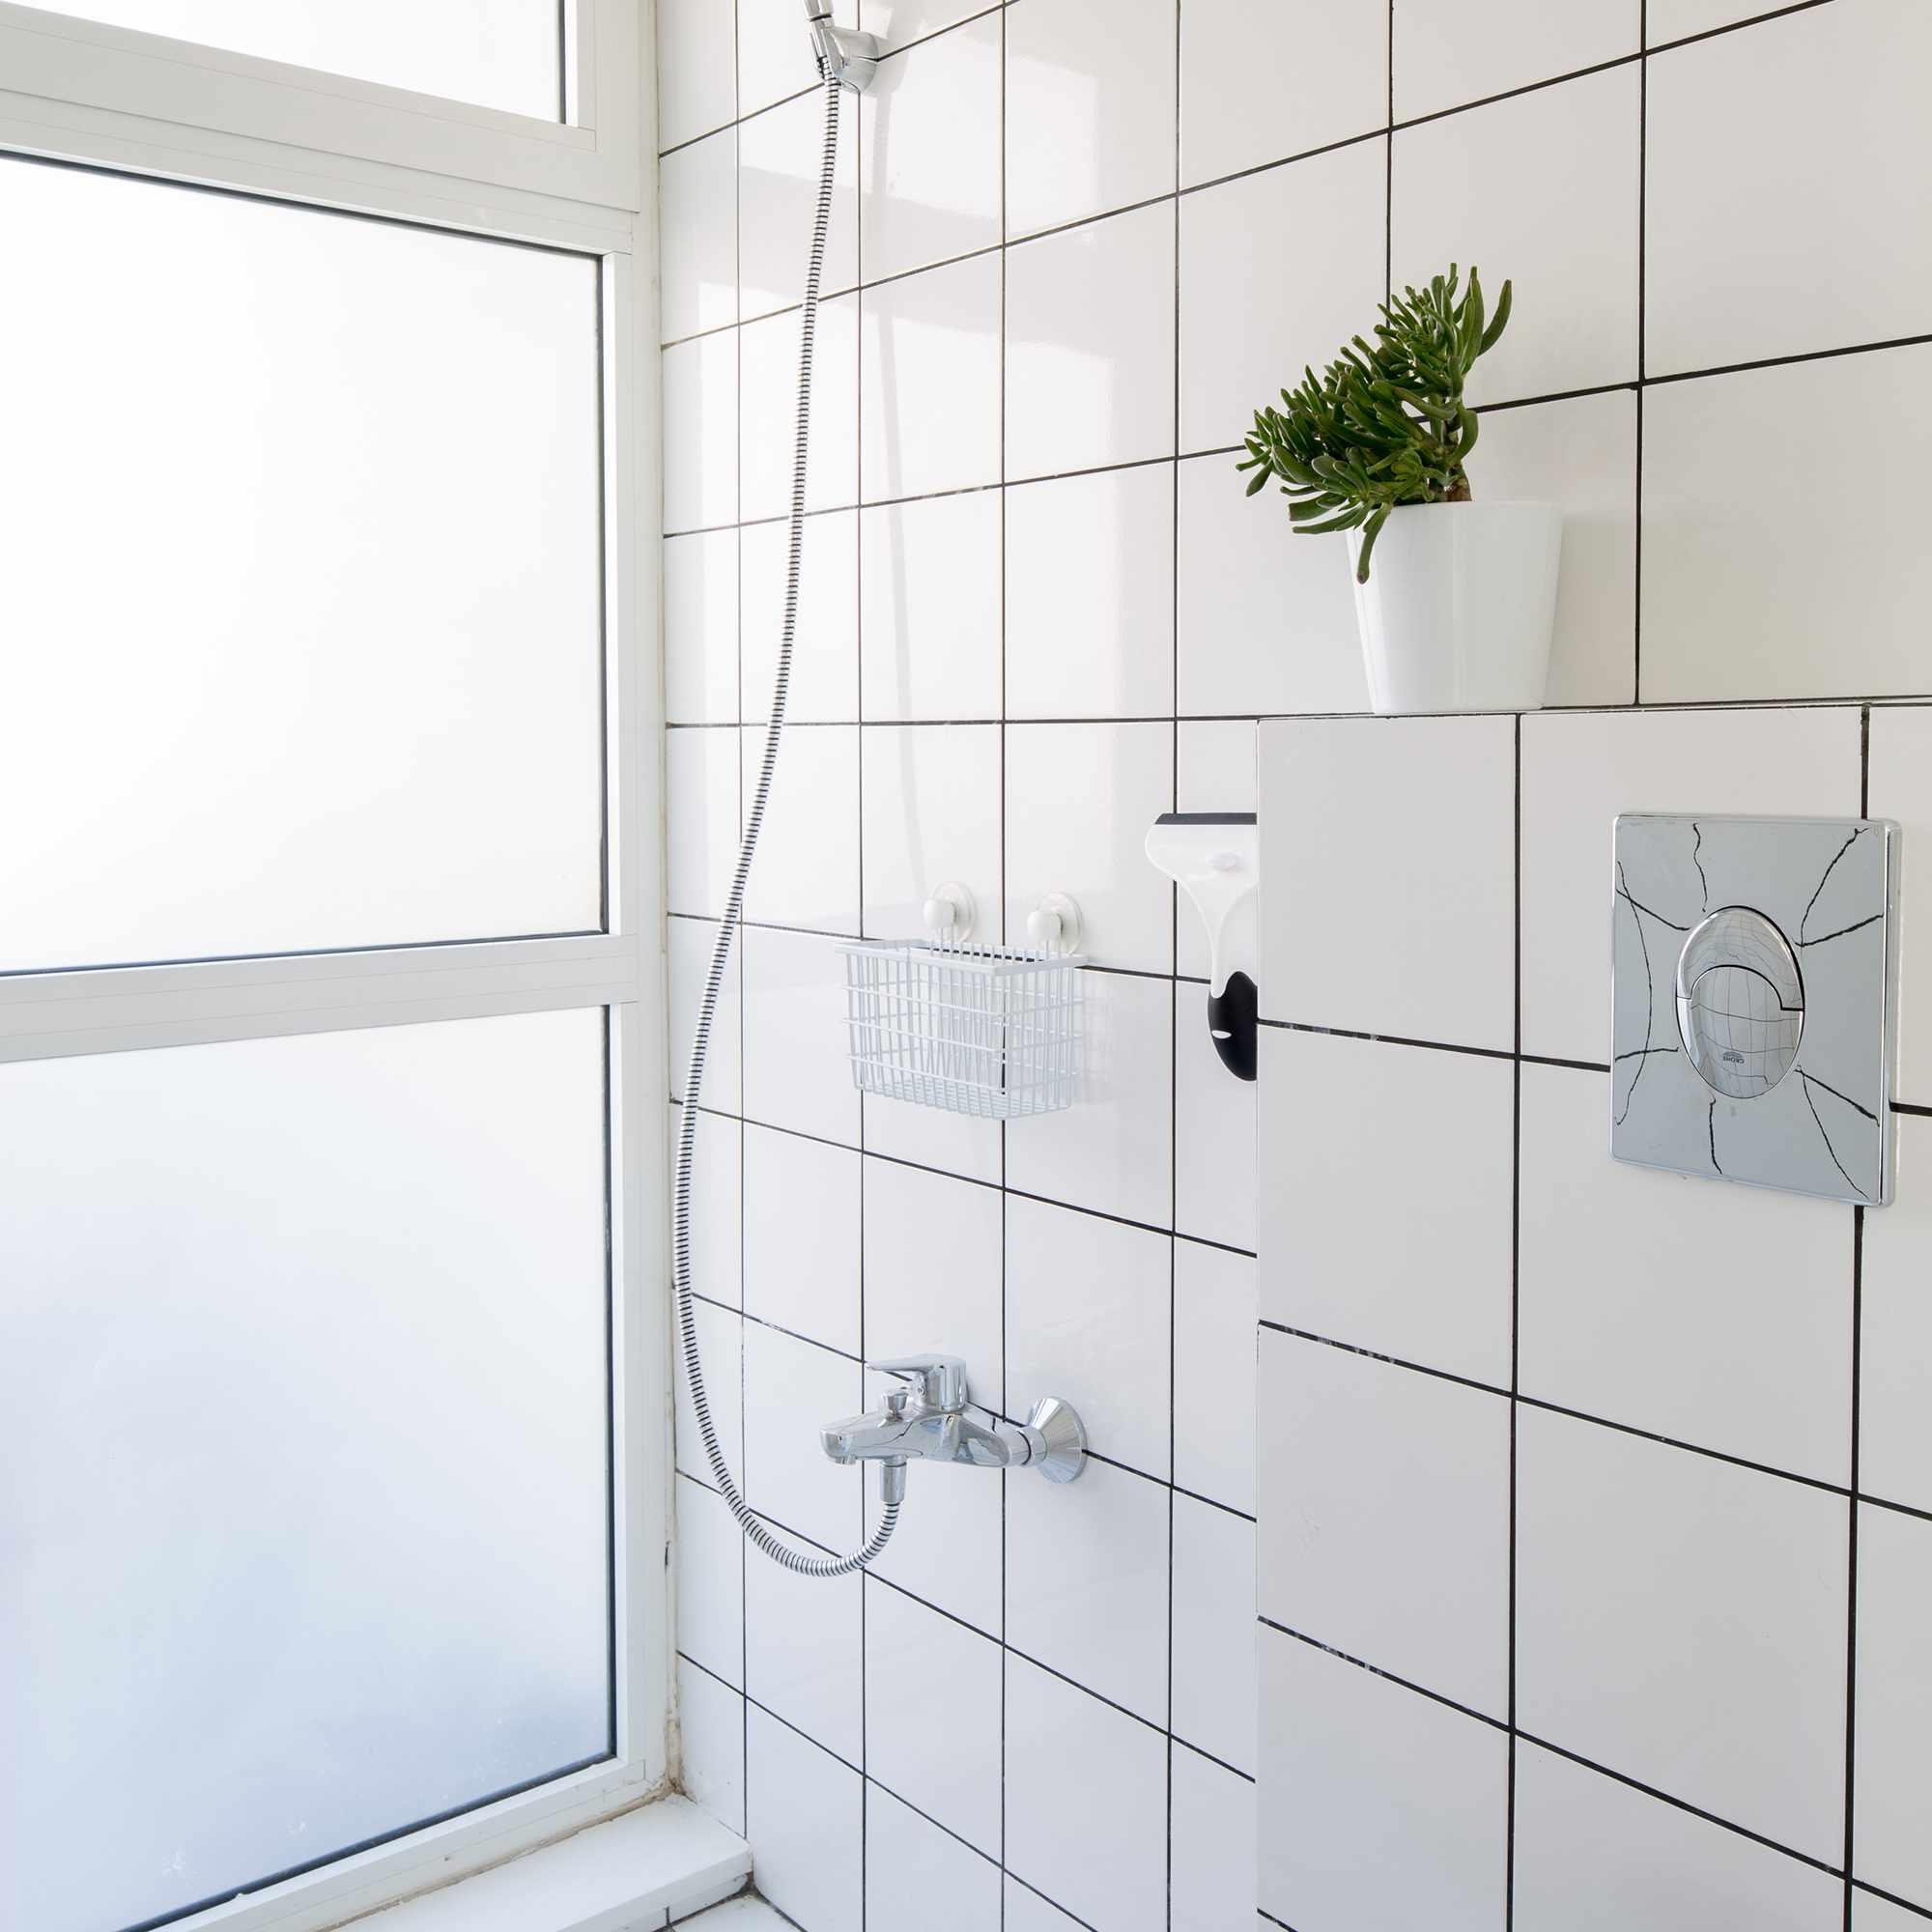 The Shoebox micro-apartment by Elie Metni bathroom